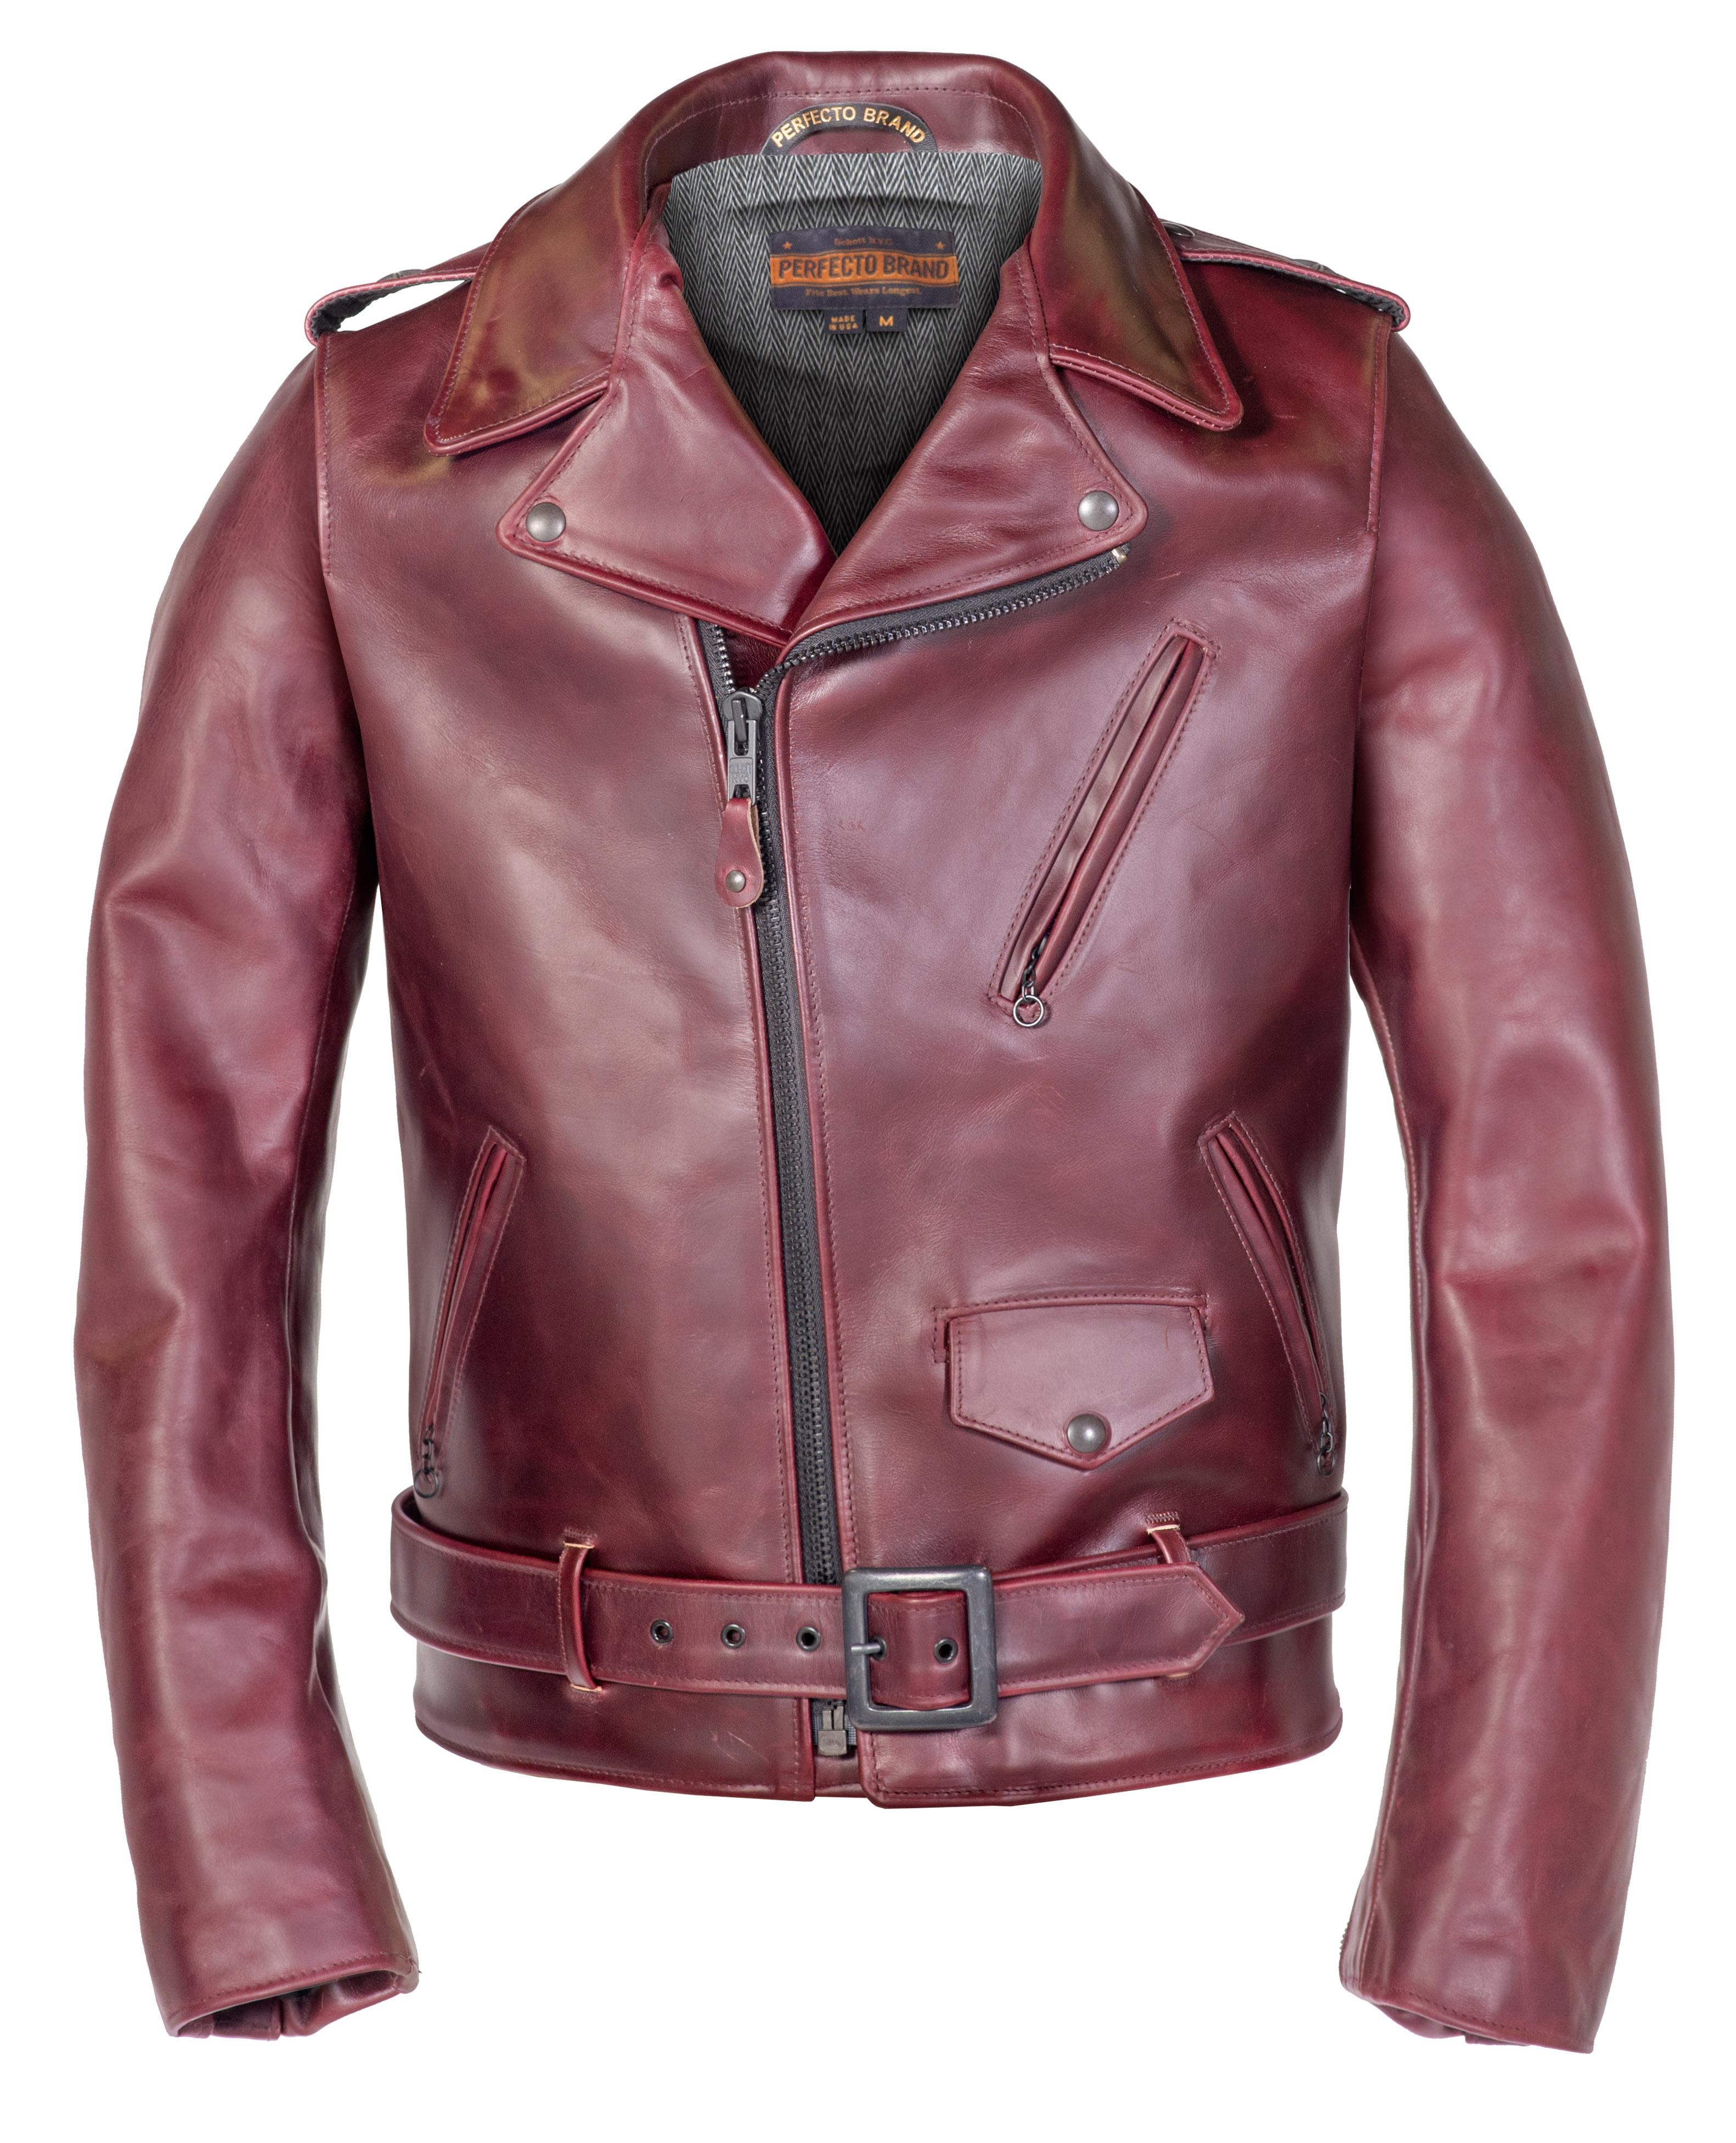 Perfecto® Brand P613S Perfecto® Steerhide Motorcycle Jacket